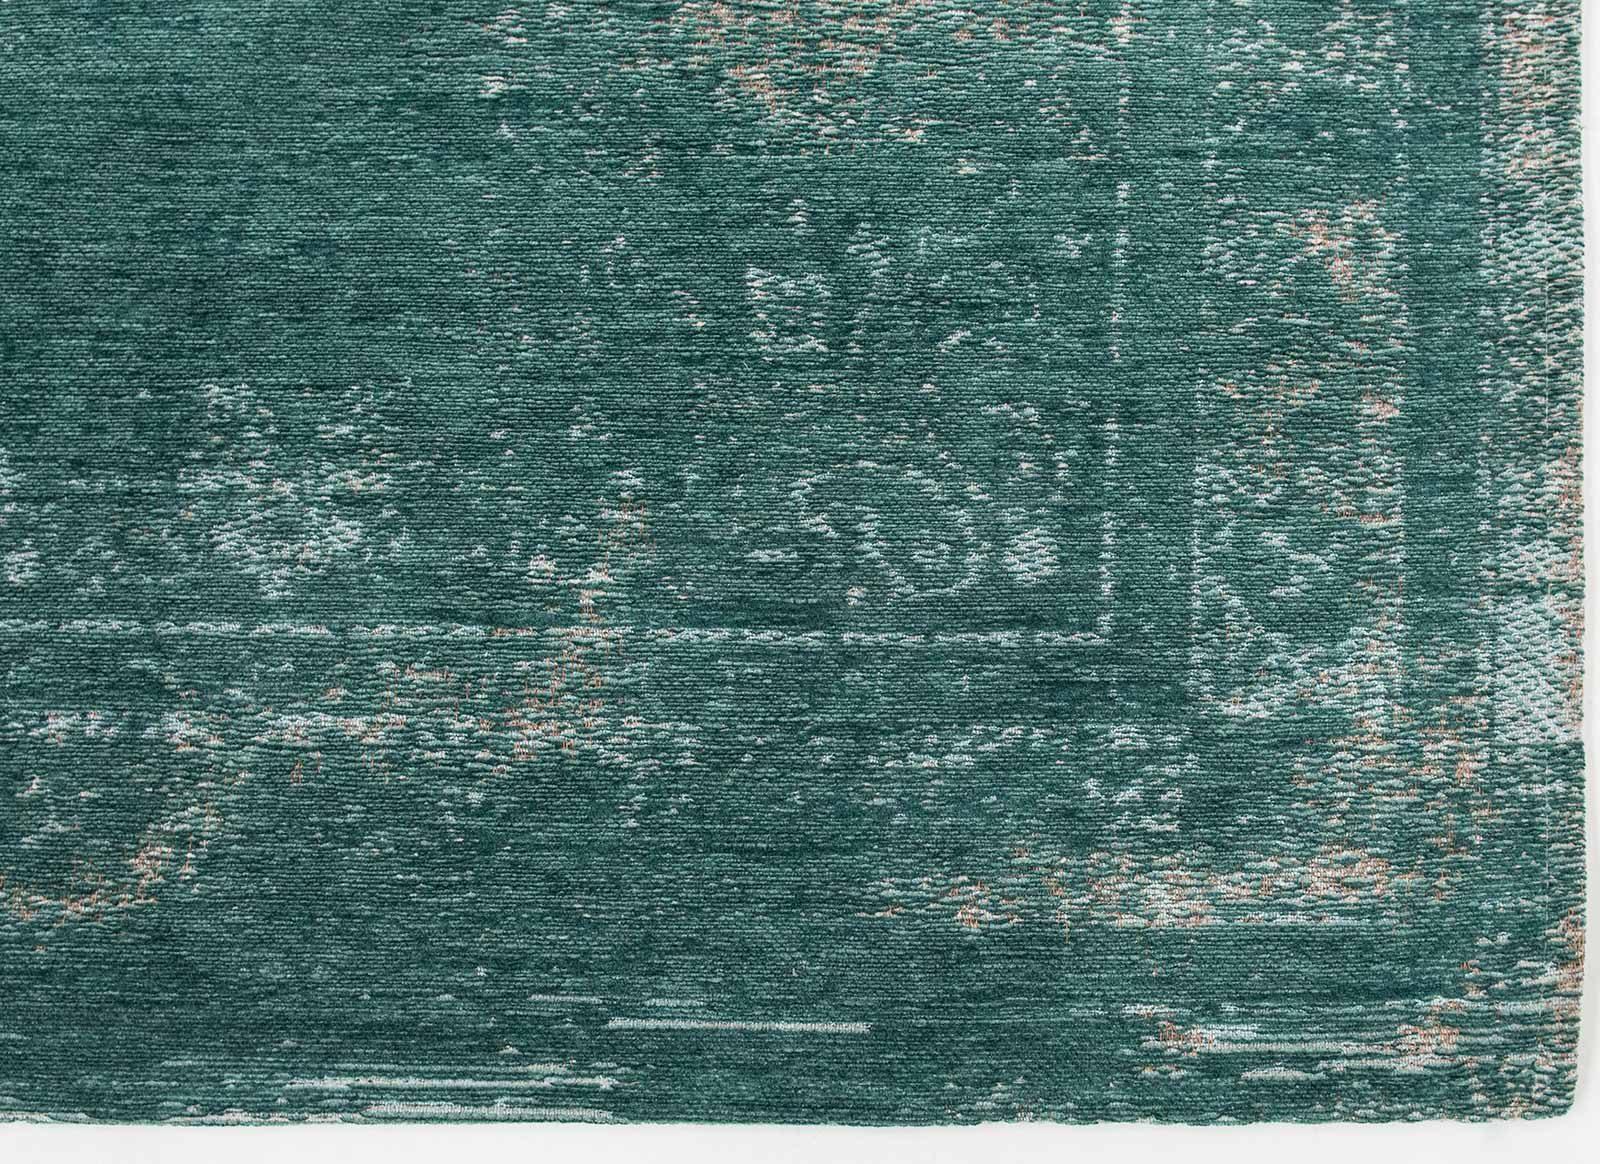 alfombras Louis De Poortere LX8258 Fading World Medaillon Jade corner